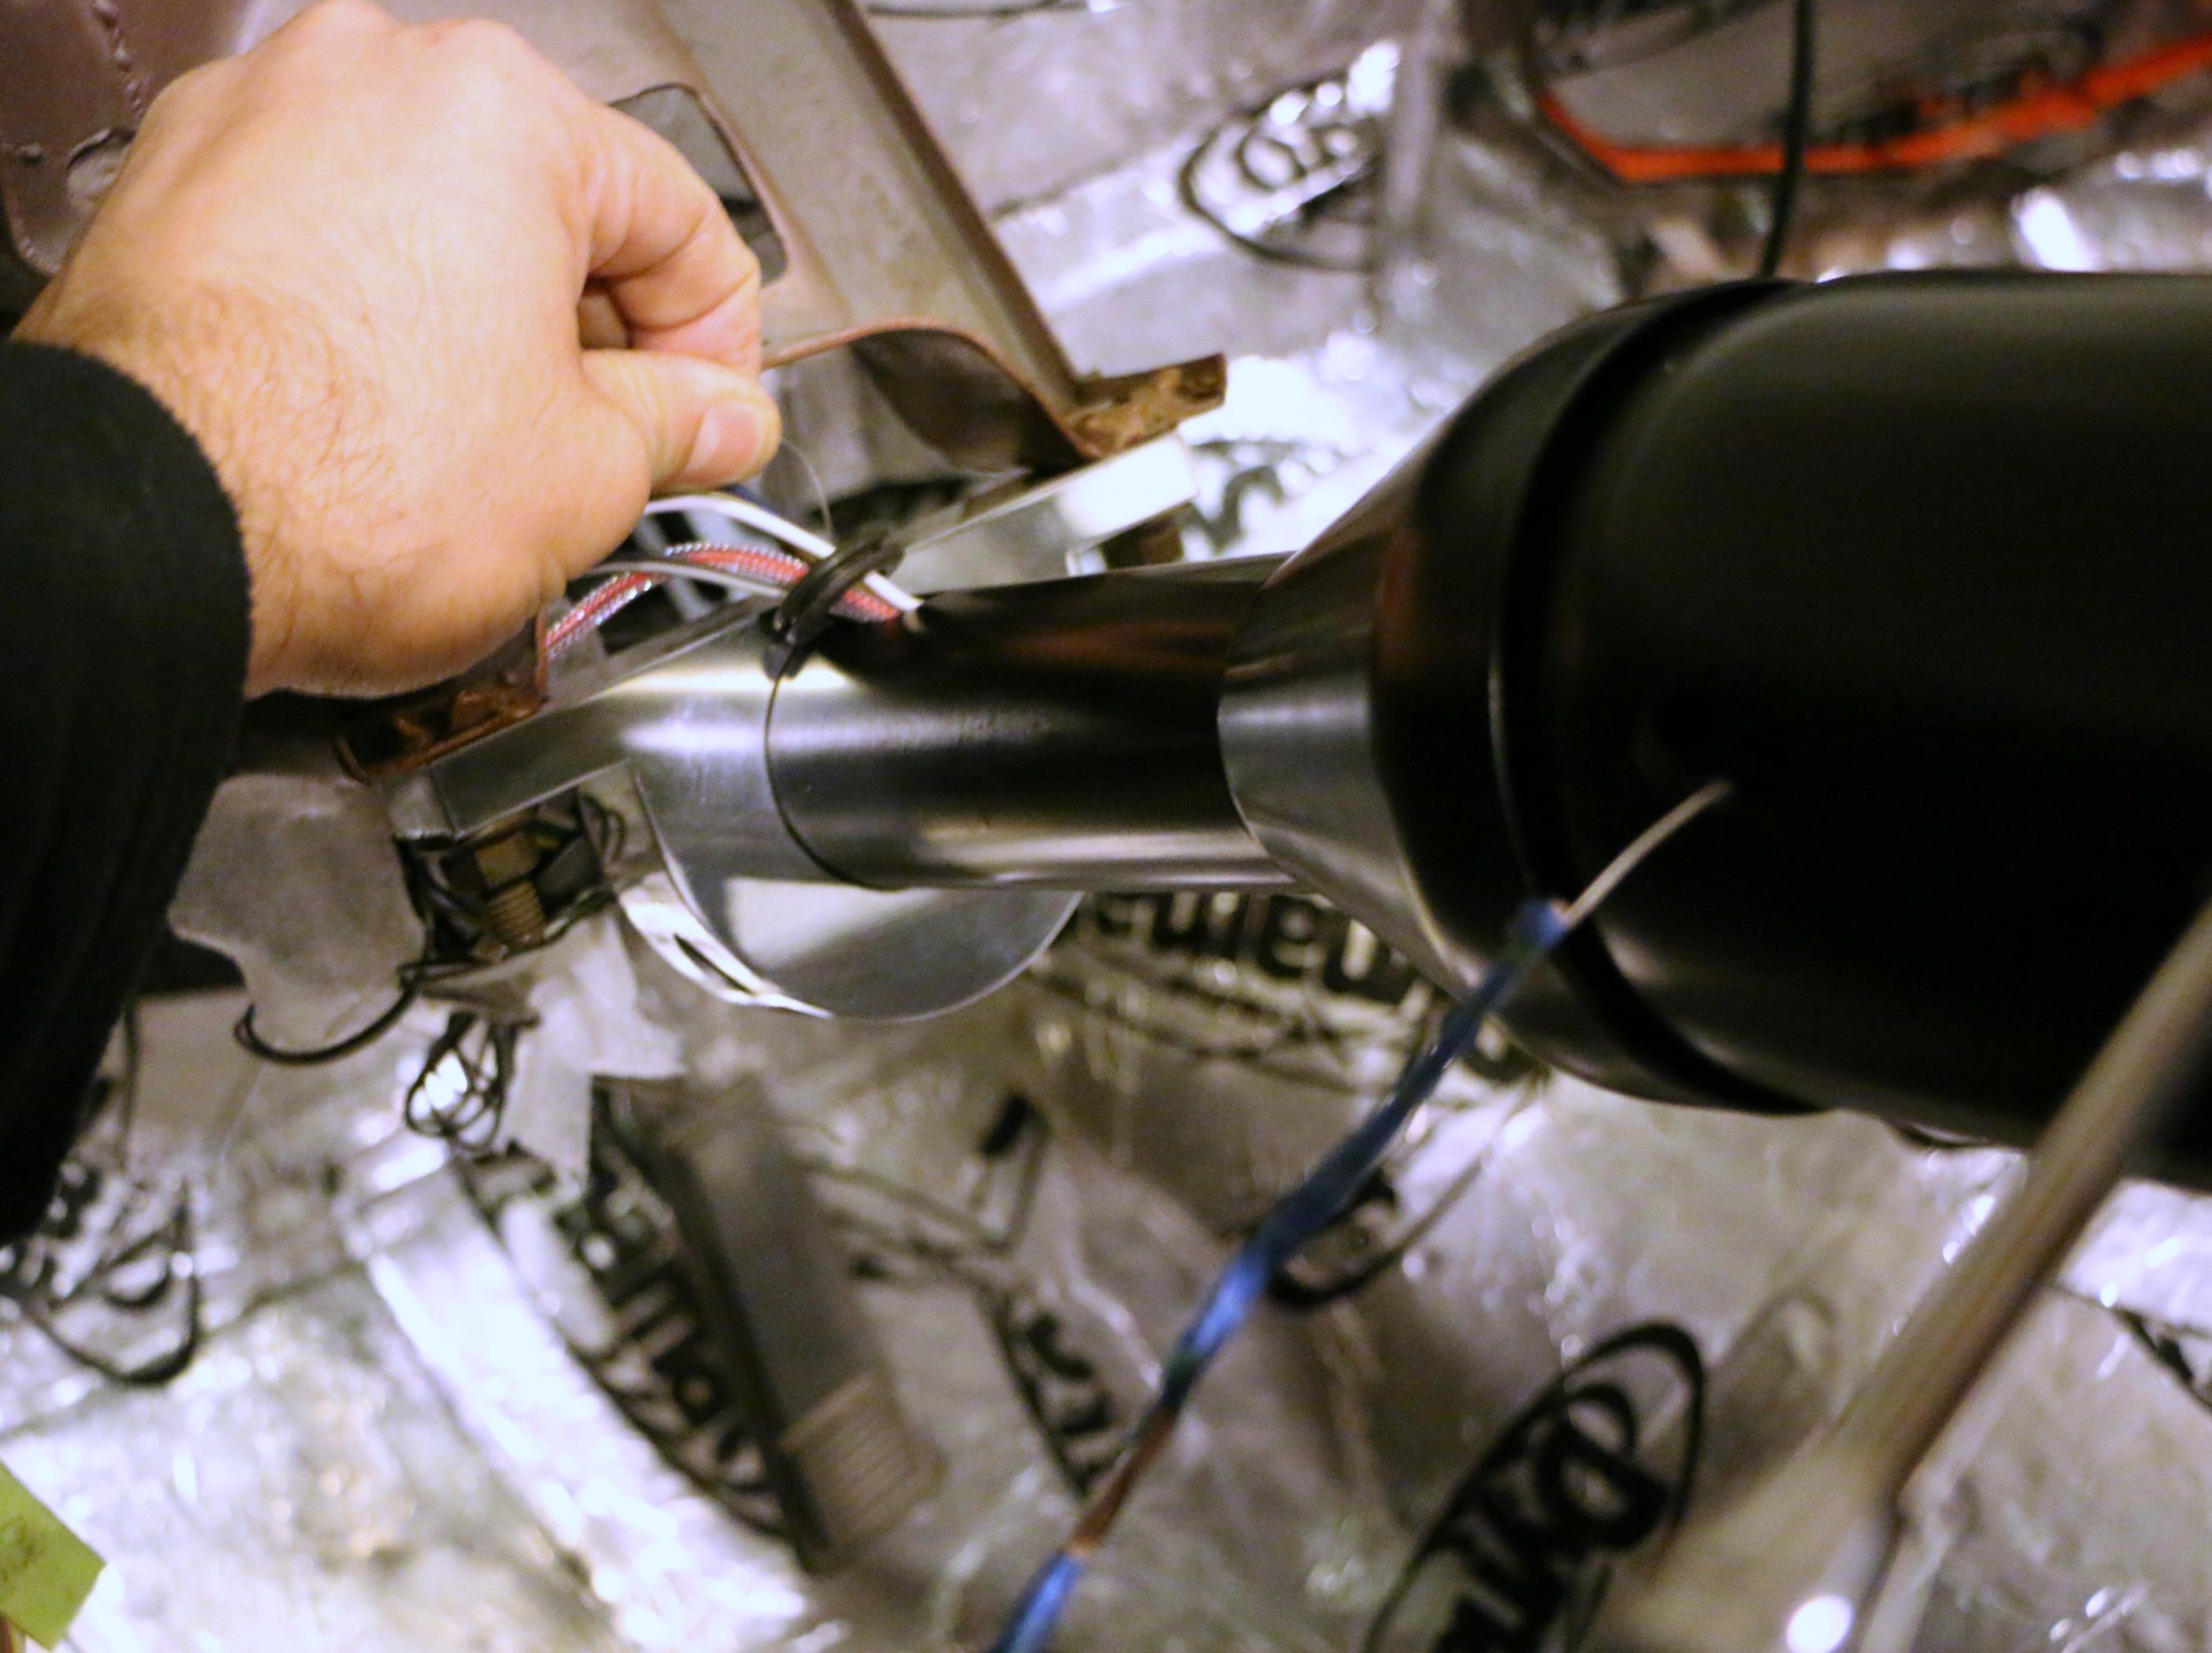 g body steering column wiring diagram honda pressure washer carburetor ididit a universal hot rod regal